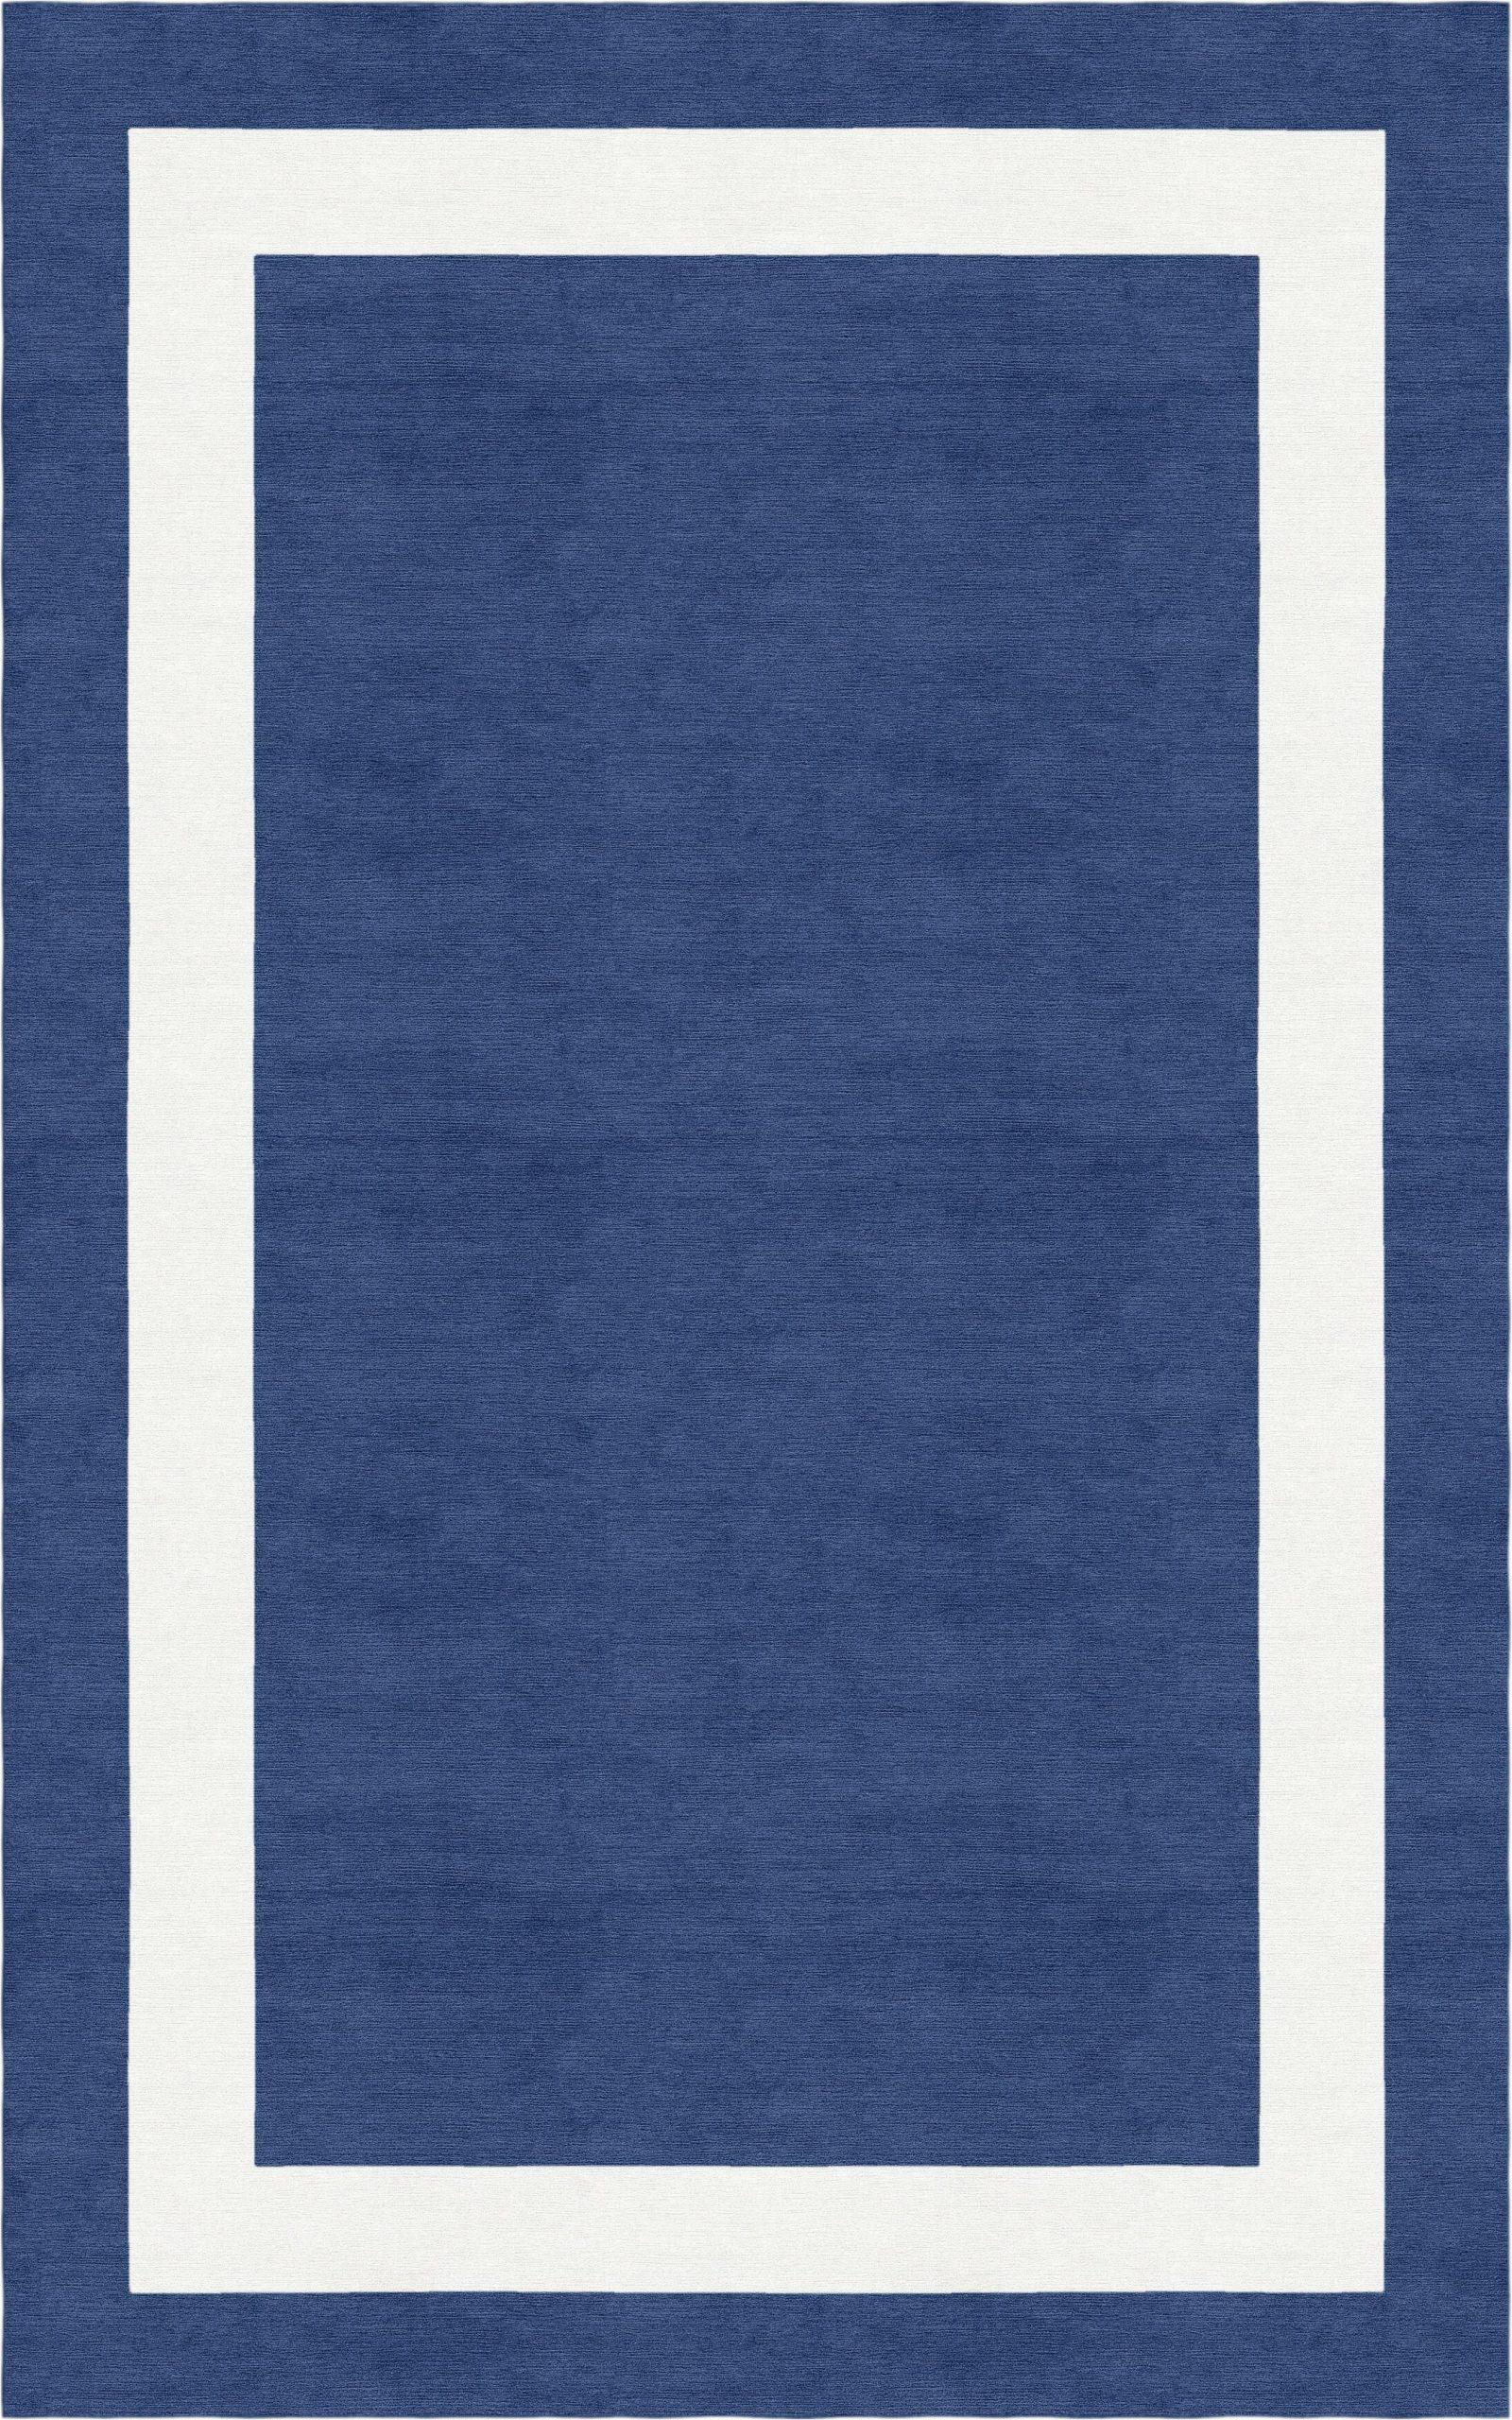 harlem border hand tufted wool navy bluewhite area rug